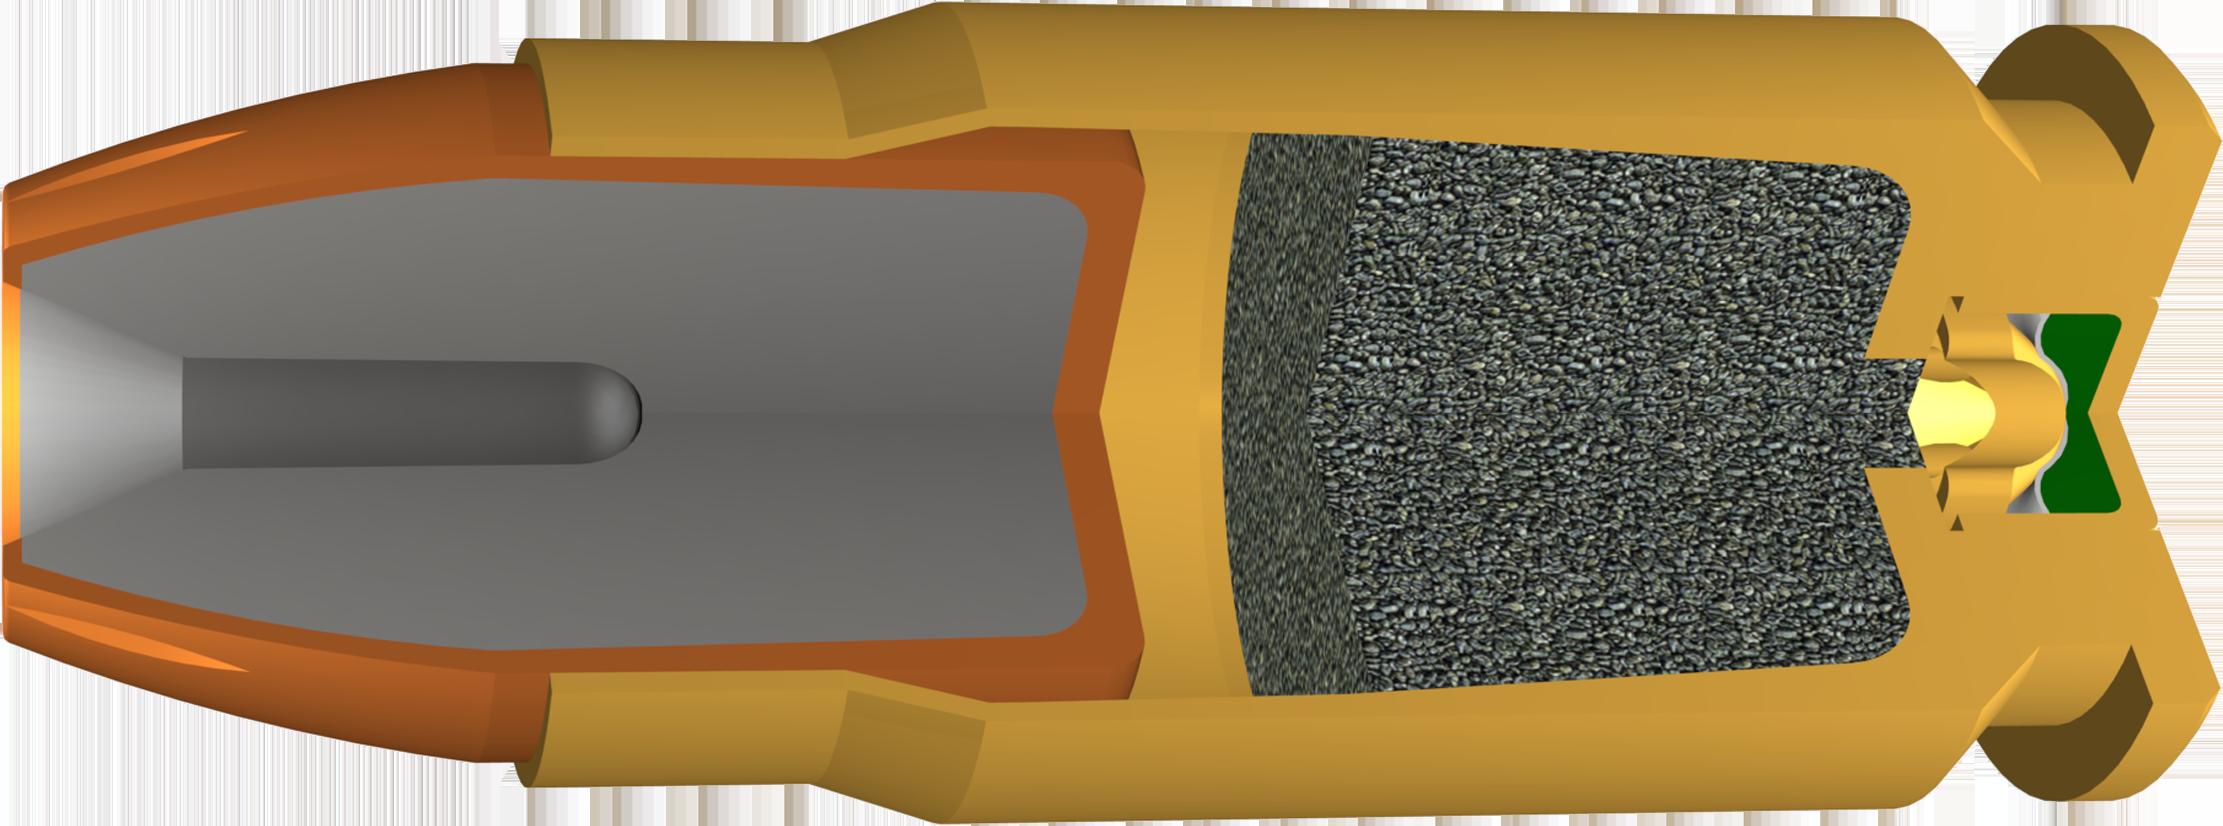 357 SIG, 125 Grain Features